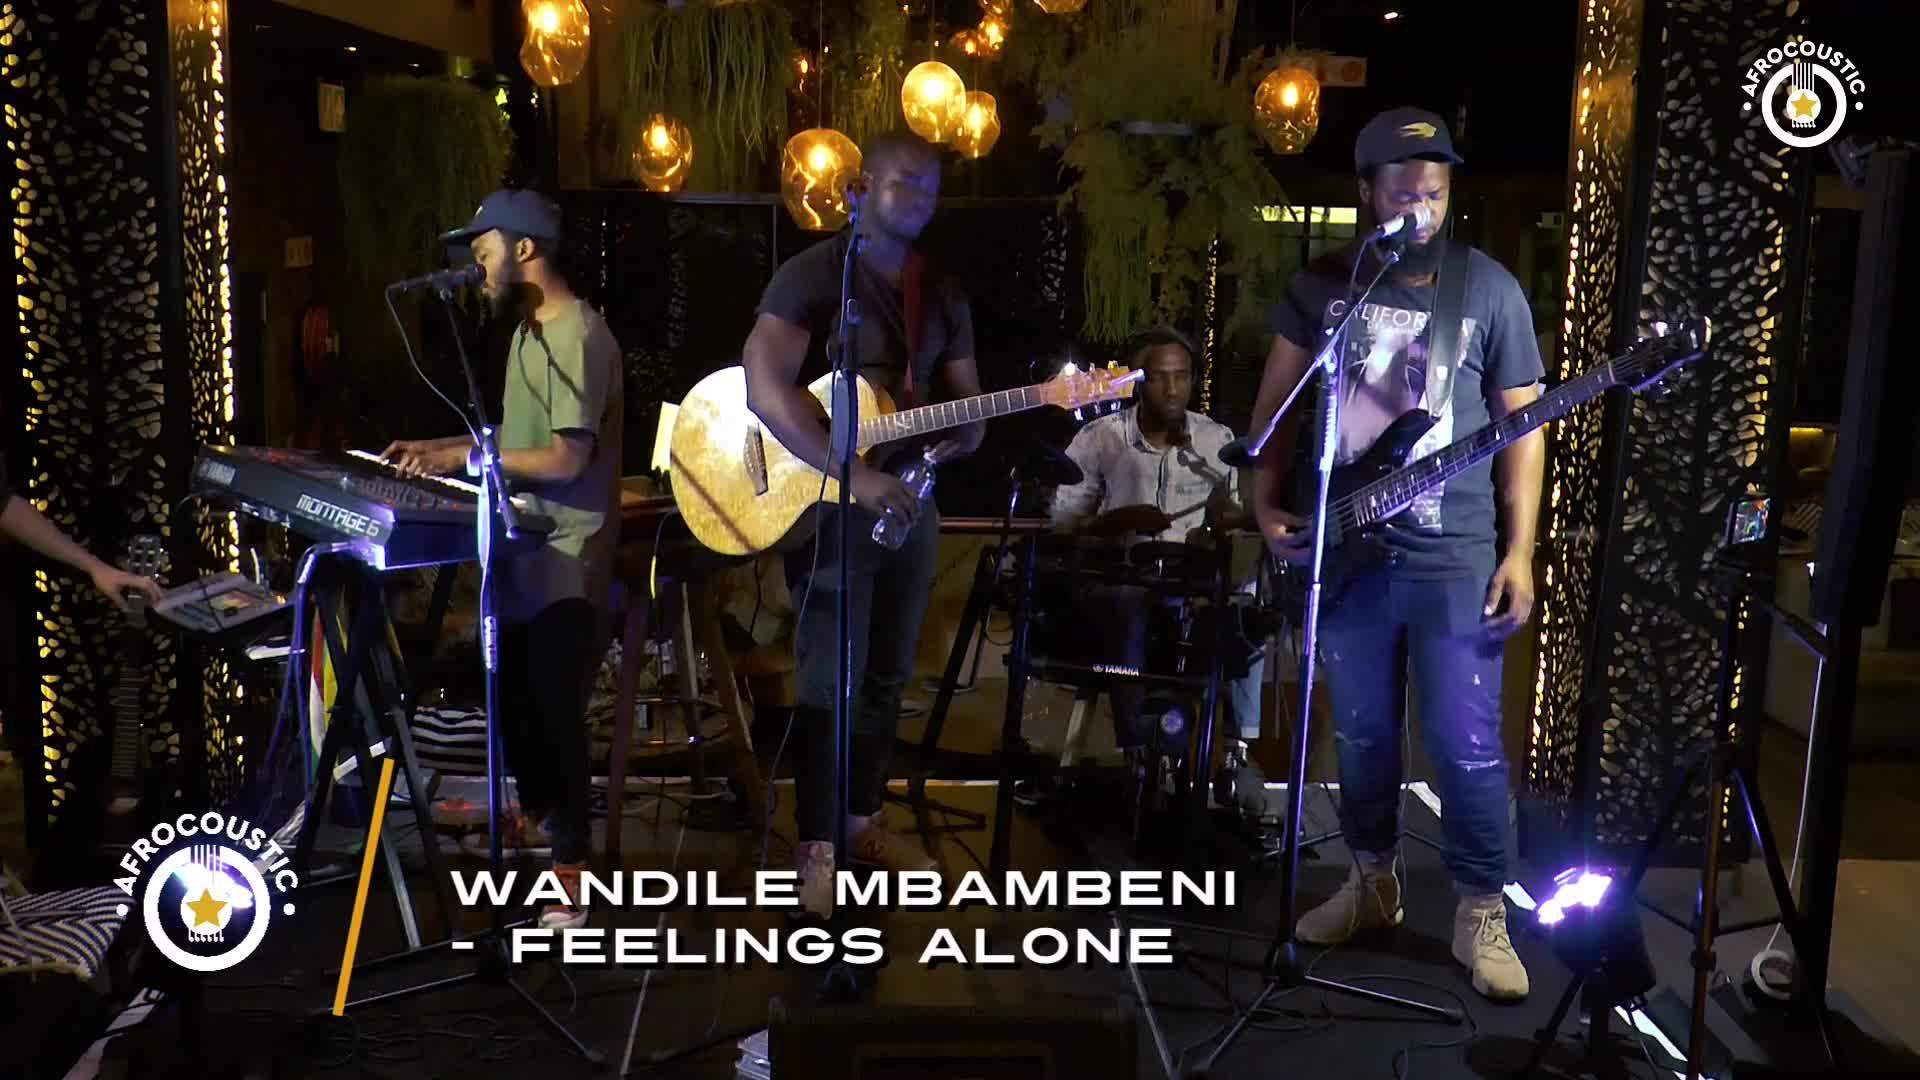 Affrocoustic - Wandile Mbambeni - Feelings Alone